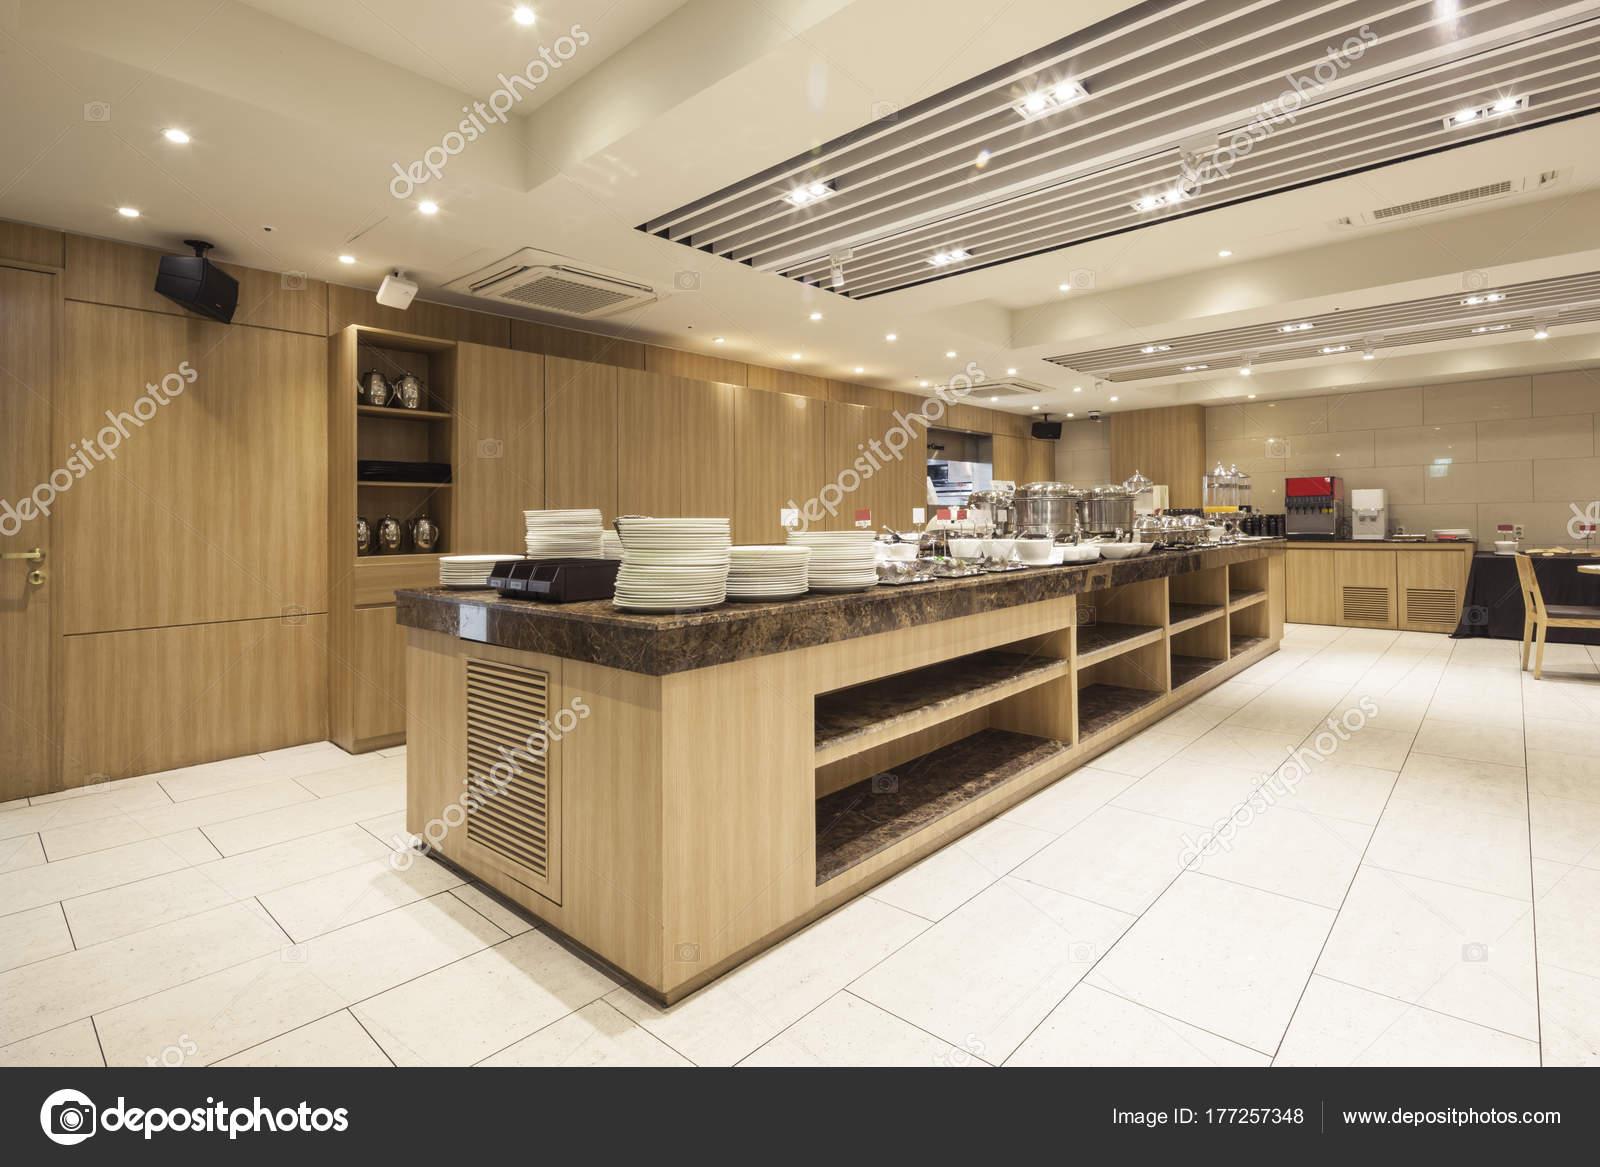 Buffet Restaurant Hotel Restaurant Stock Photo C Earlyspring 177257348